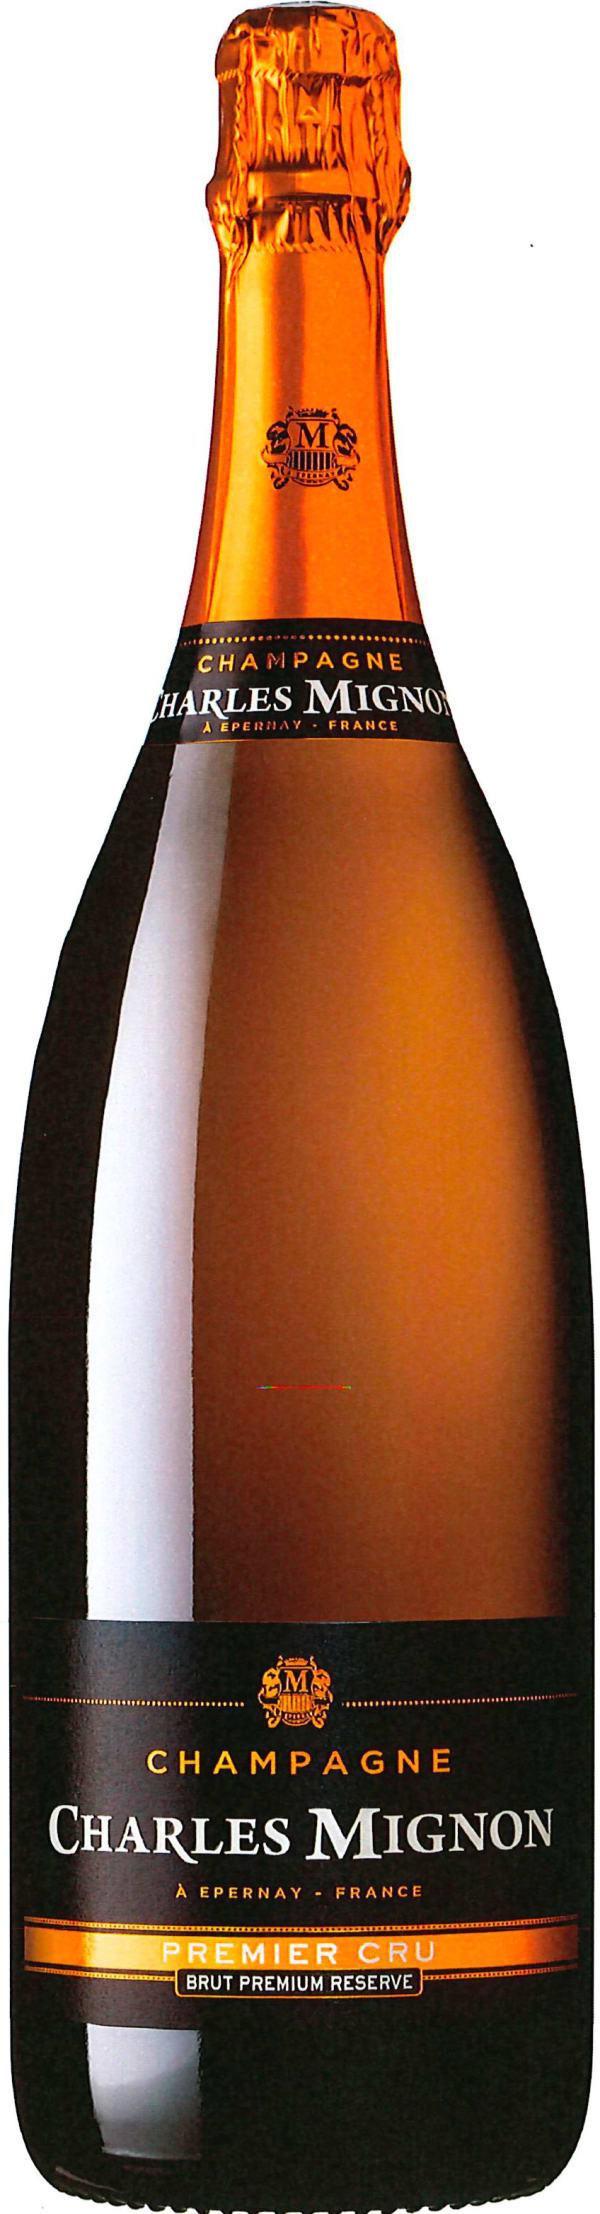 Charles Mignon 1er Cru Premium Reserve Champagne Brut Jeroboam